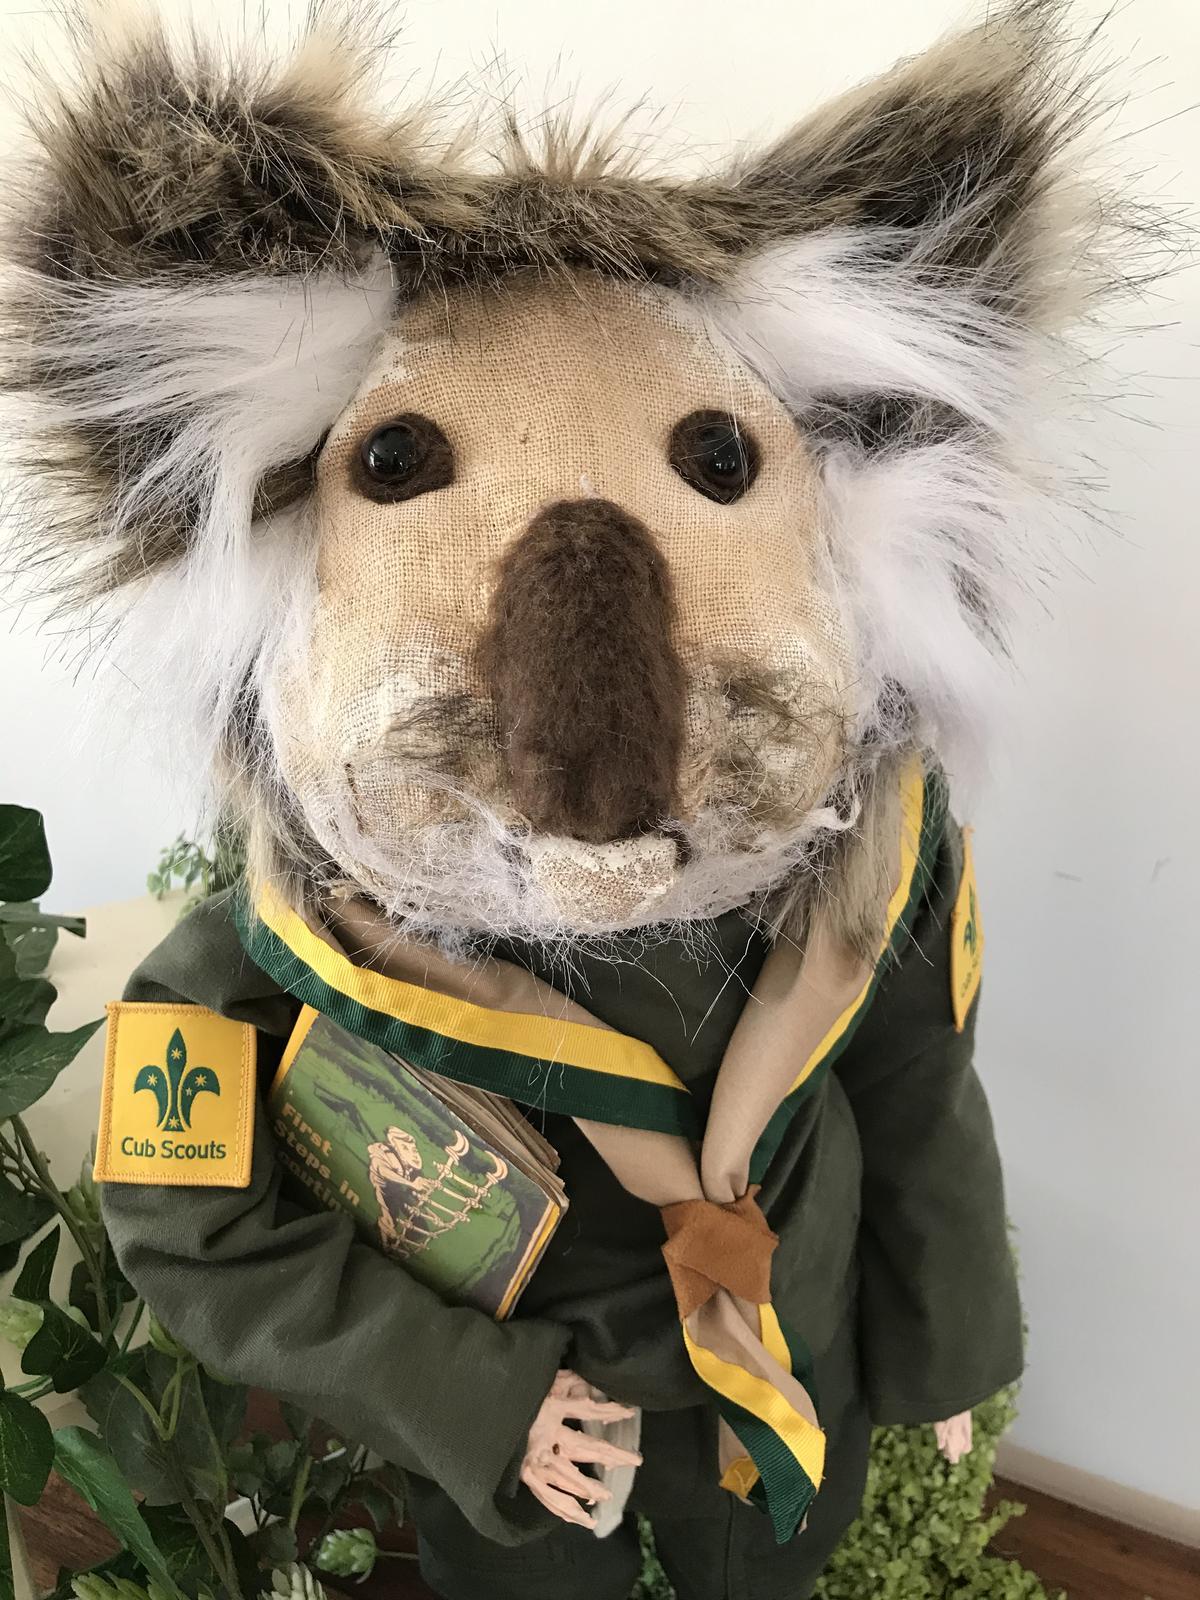 Anthropomorphic Koala boy scout